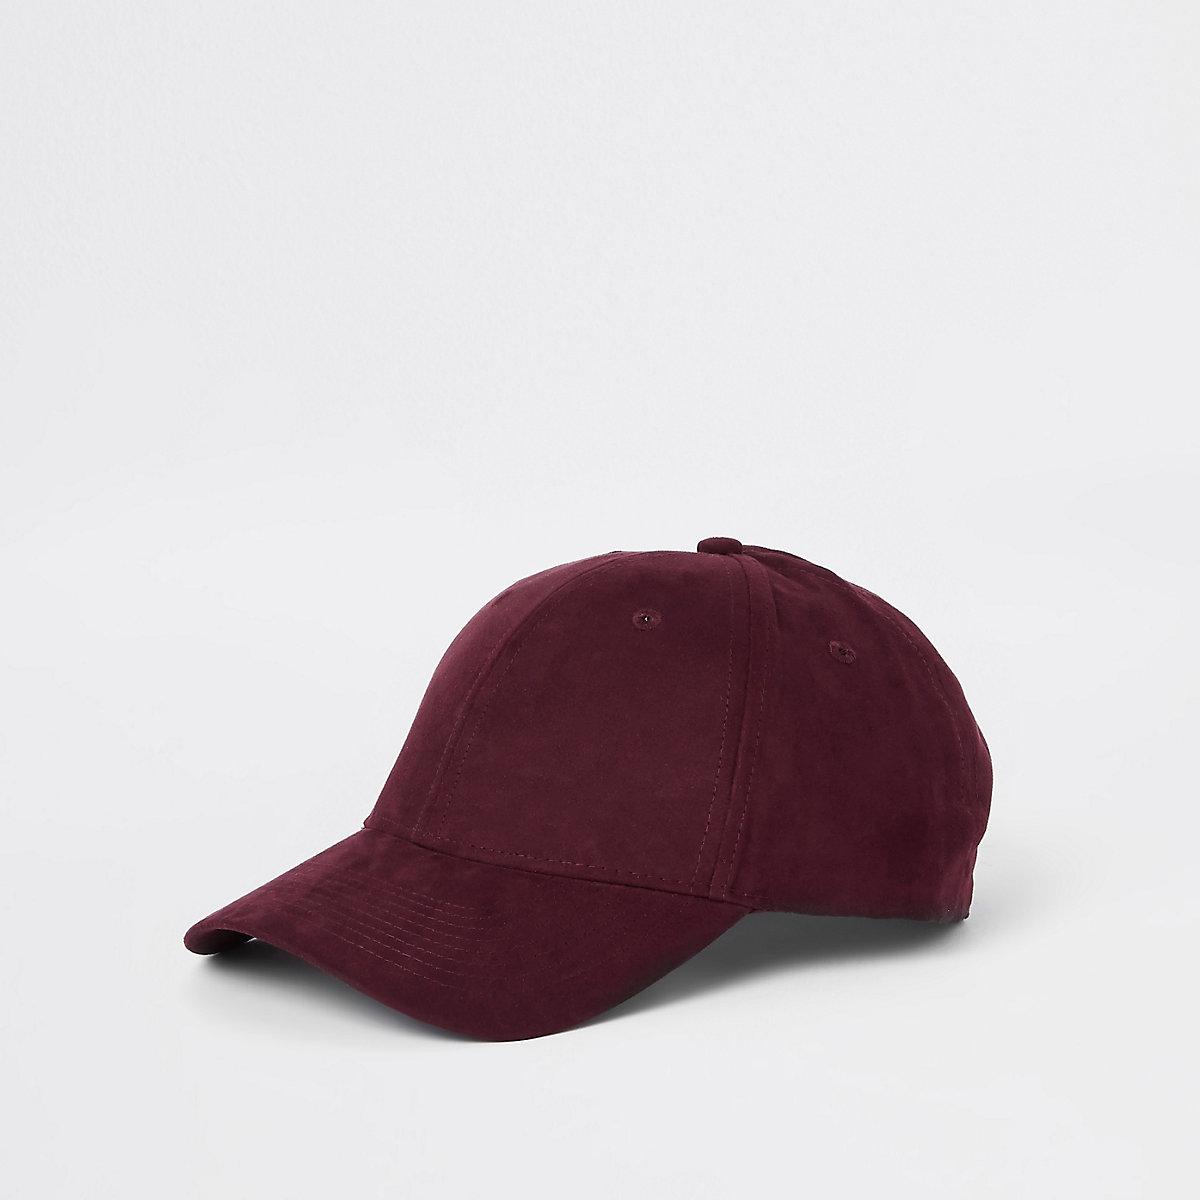 Dark red suede baseball cap